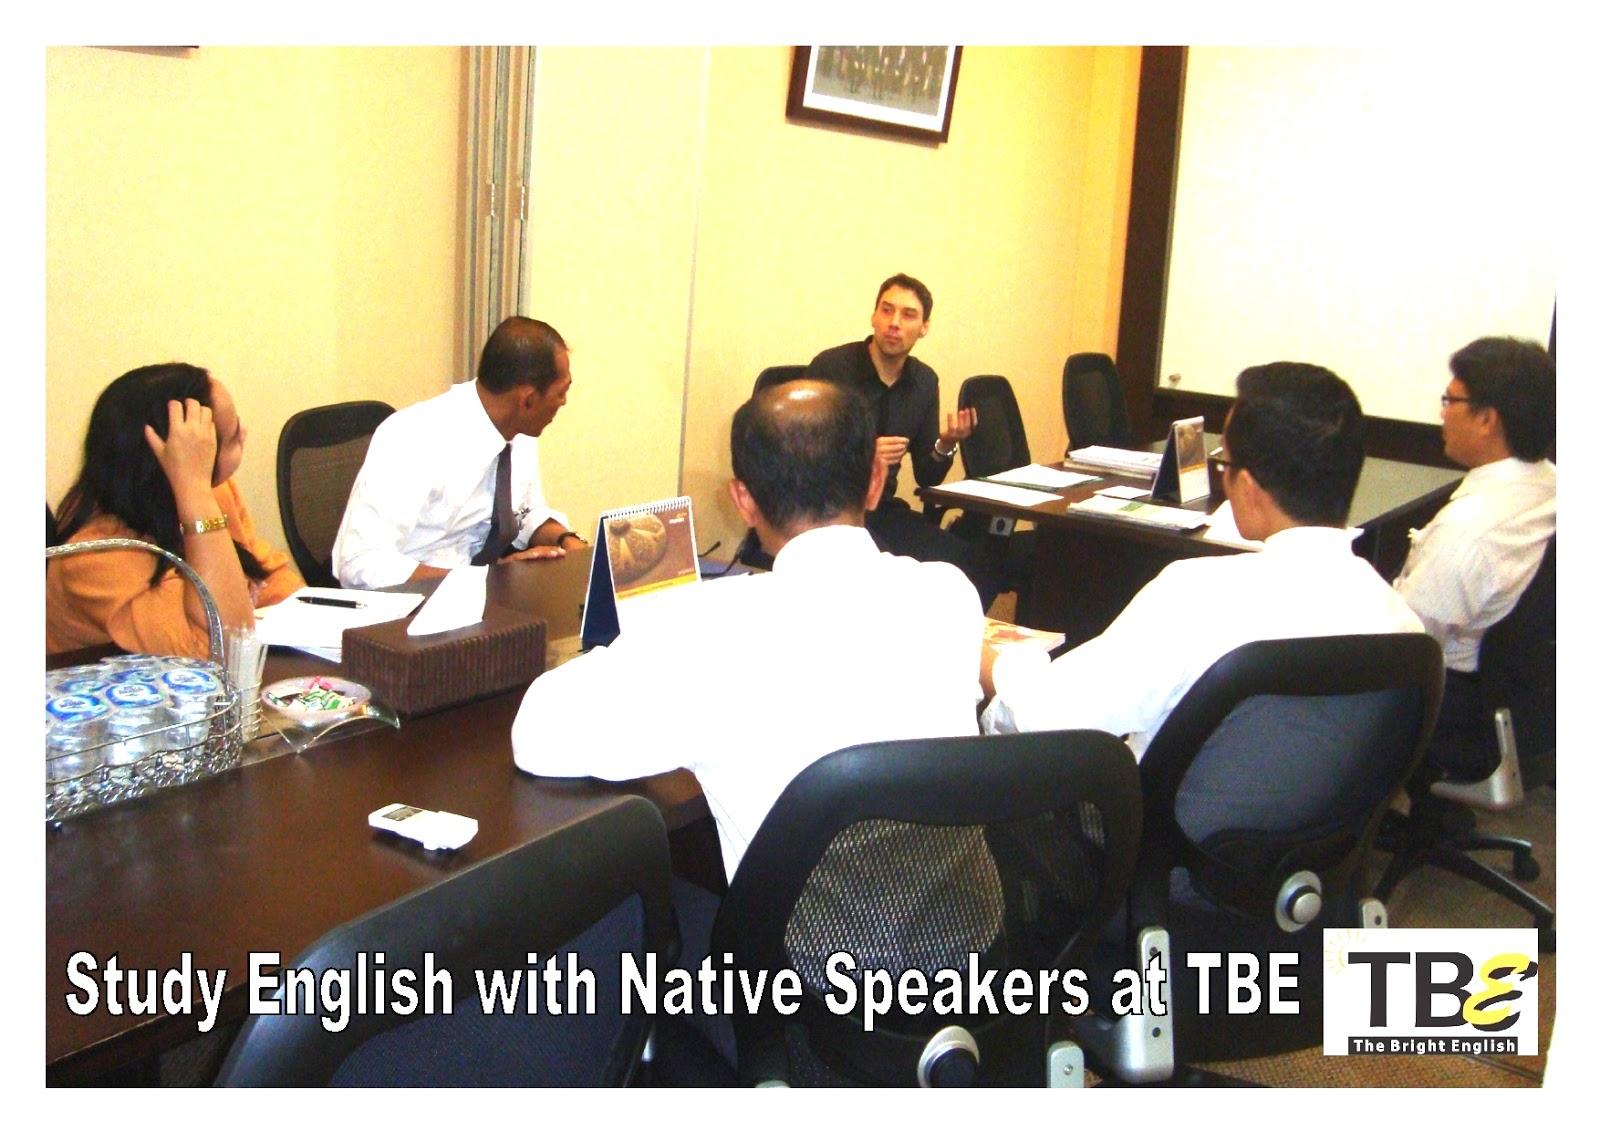 The Bright English Brightening Your English Mengapa Penting Untuk Belajar Bahasa Inggris Bersama English Native Speakers